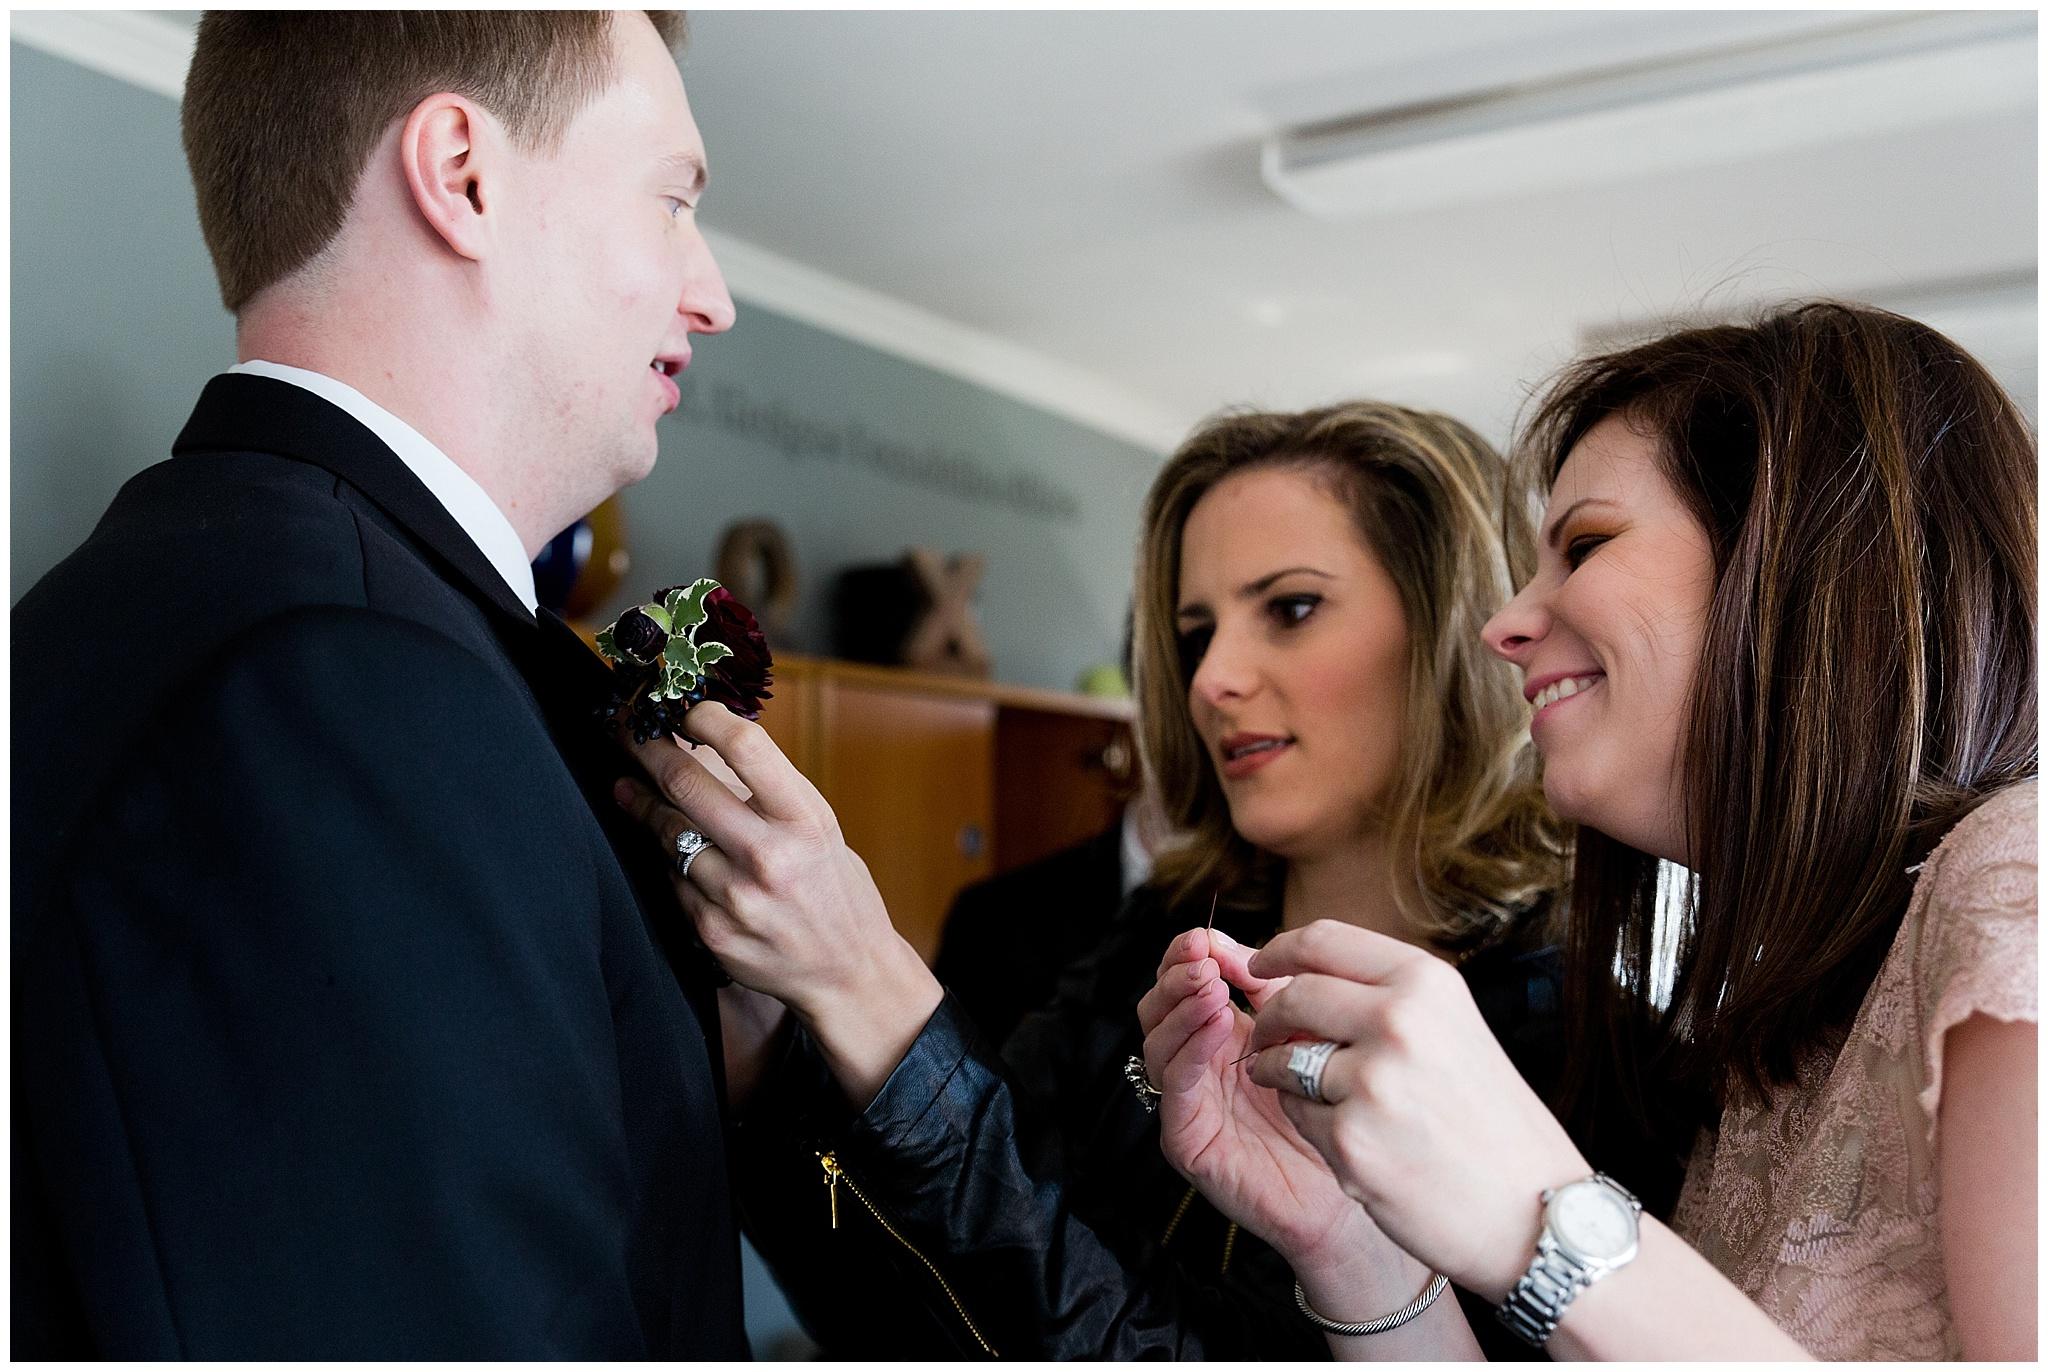 Carol_and_Grant_Wedding_3-3-18-7536.jpg